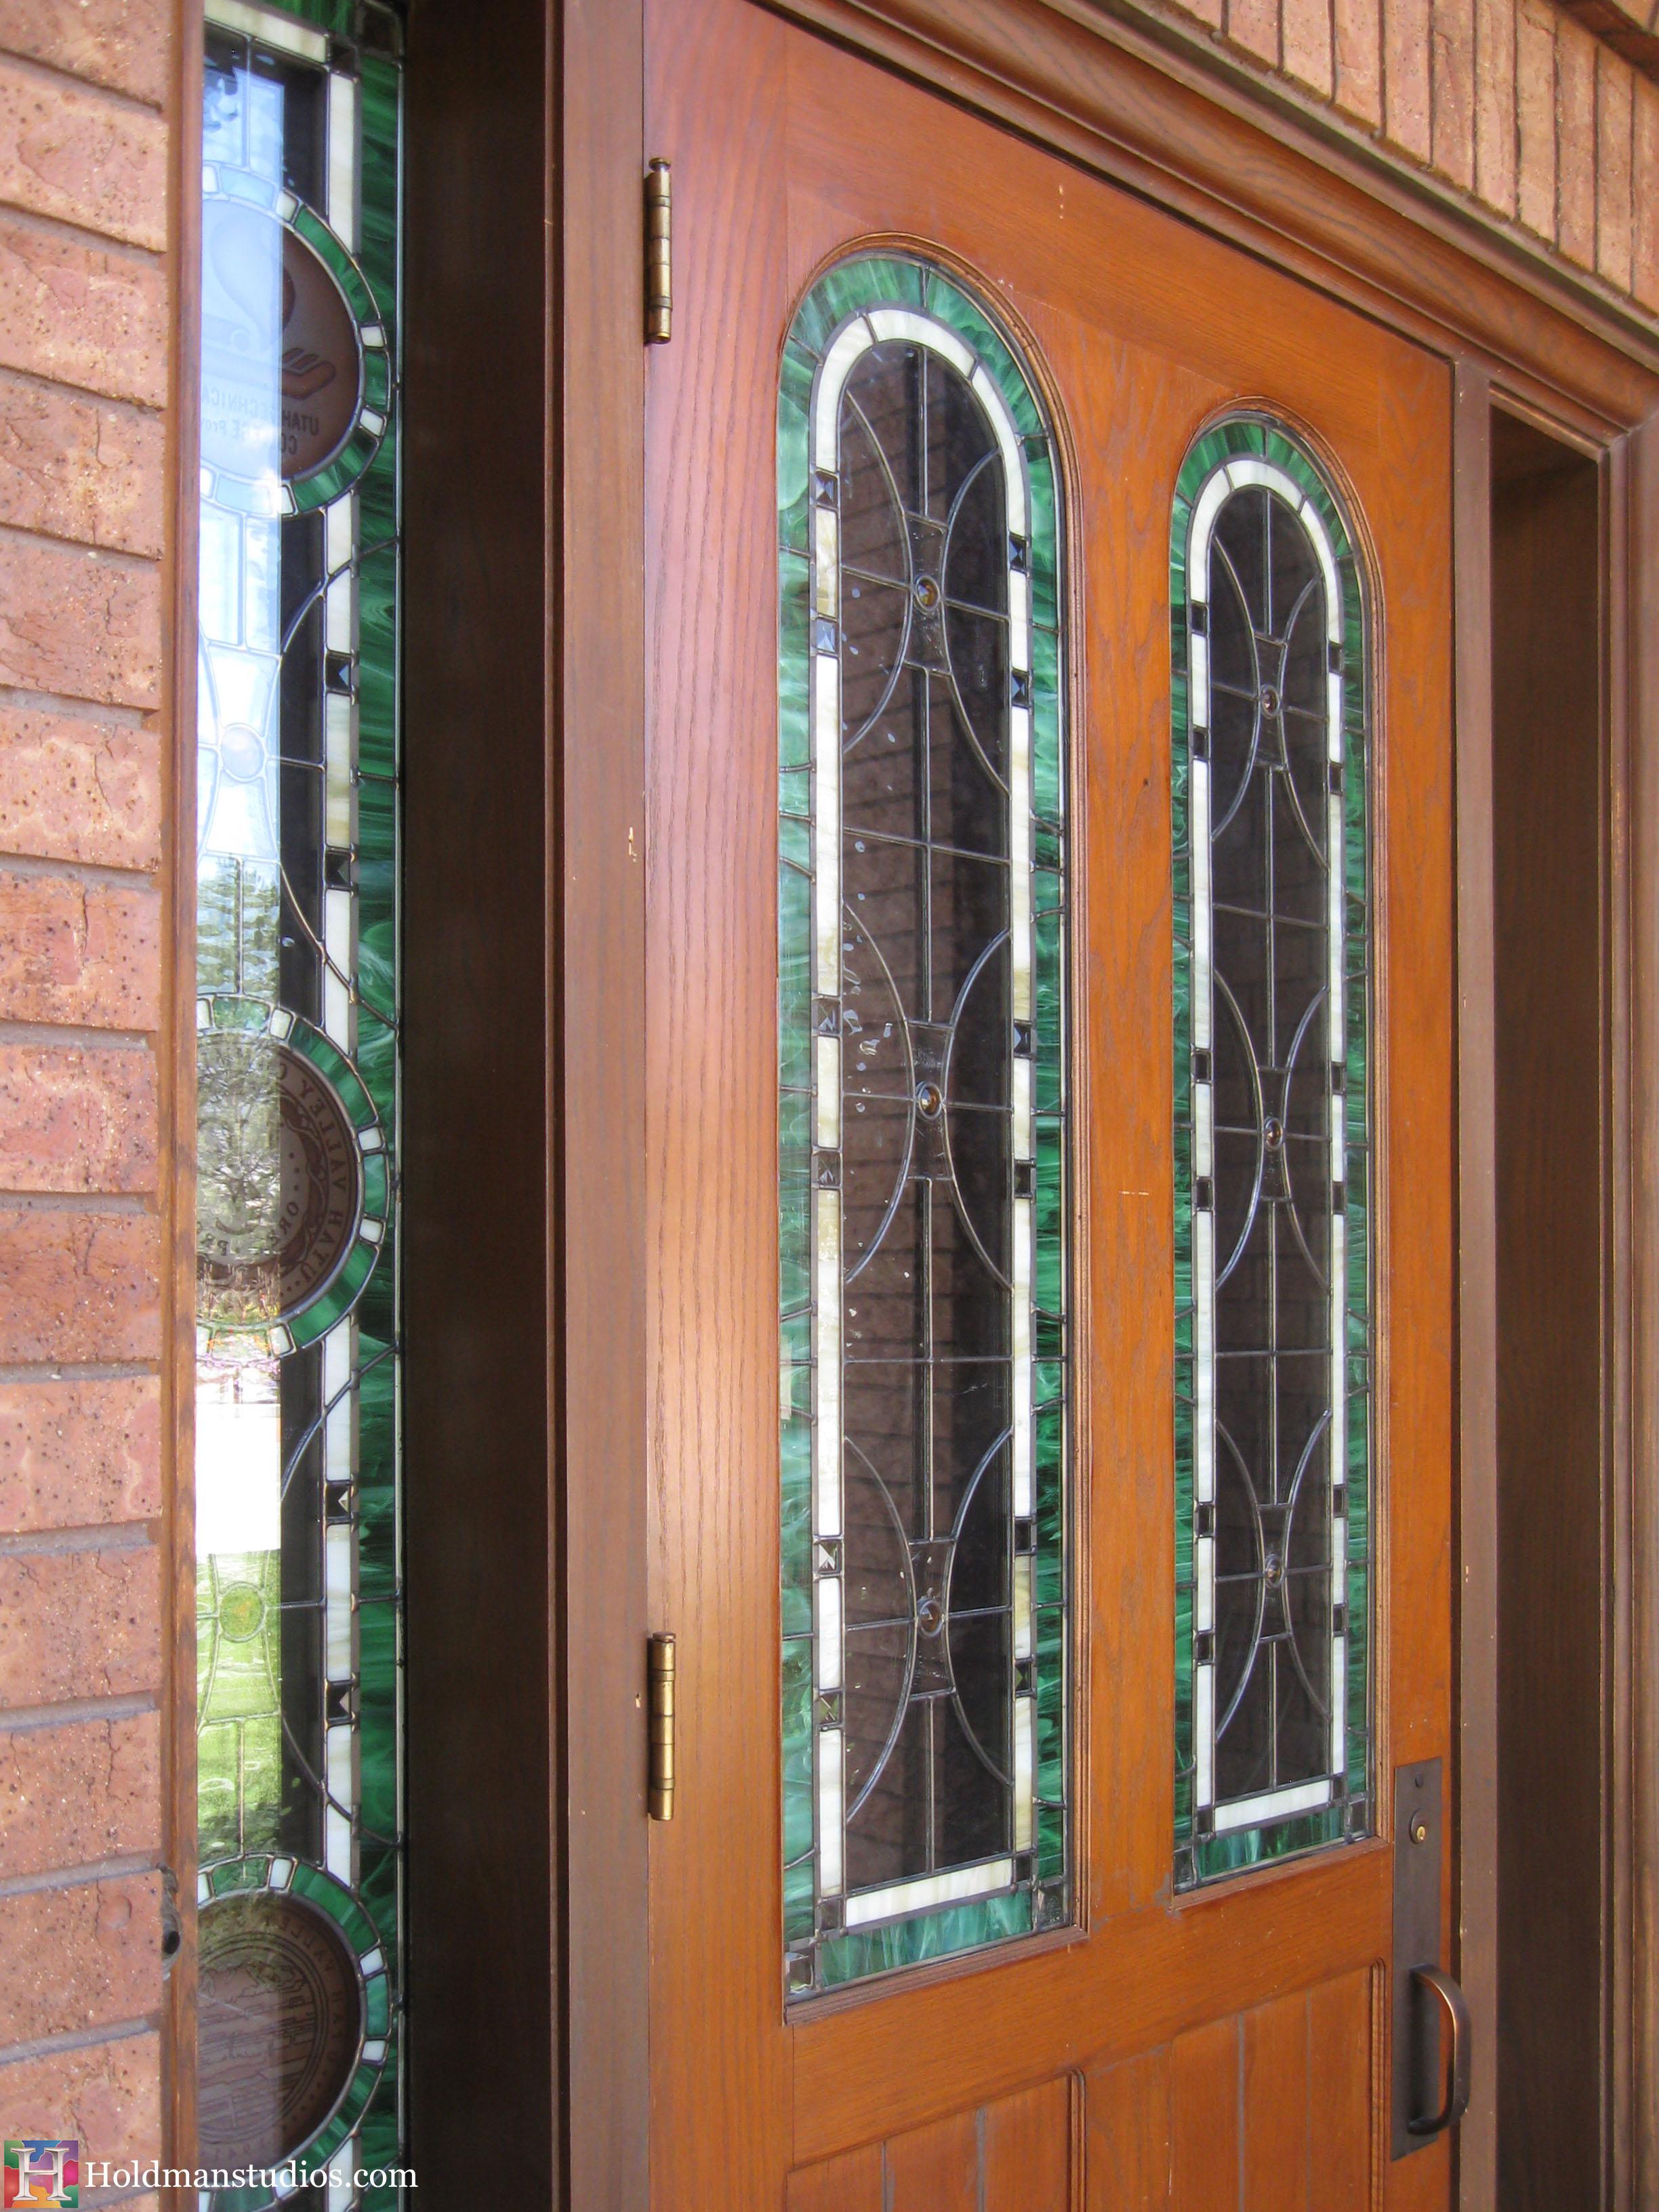 Holdman-studios-stained-glass-front-door-sidelight-windows-utah-valley-university-alumni-house.jpg